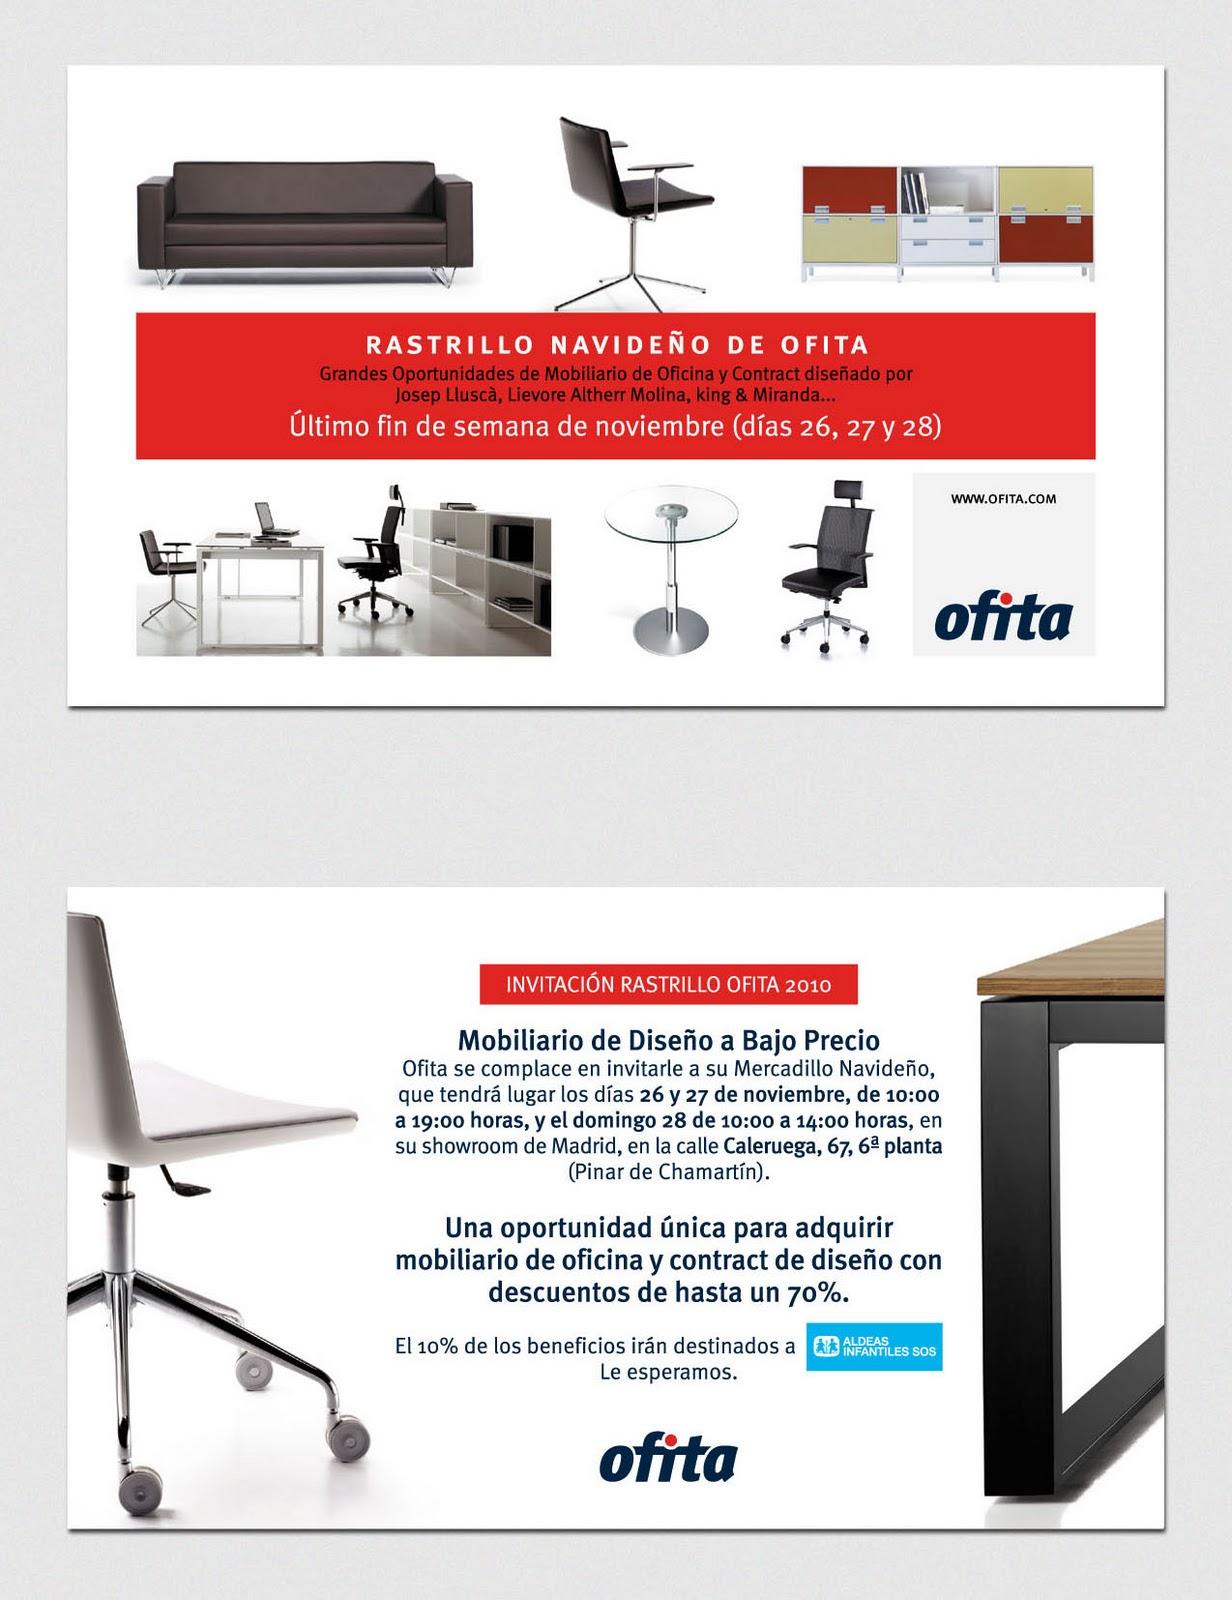 Mercadillos and markets ratrillo navide o de ofita 2010 for Oficina recaudacion madrid